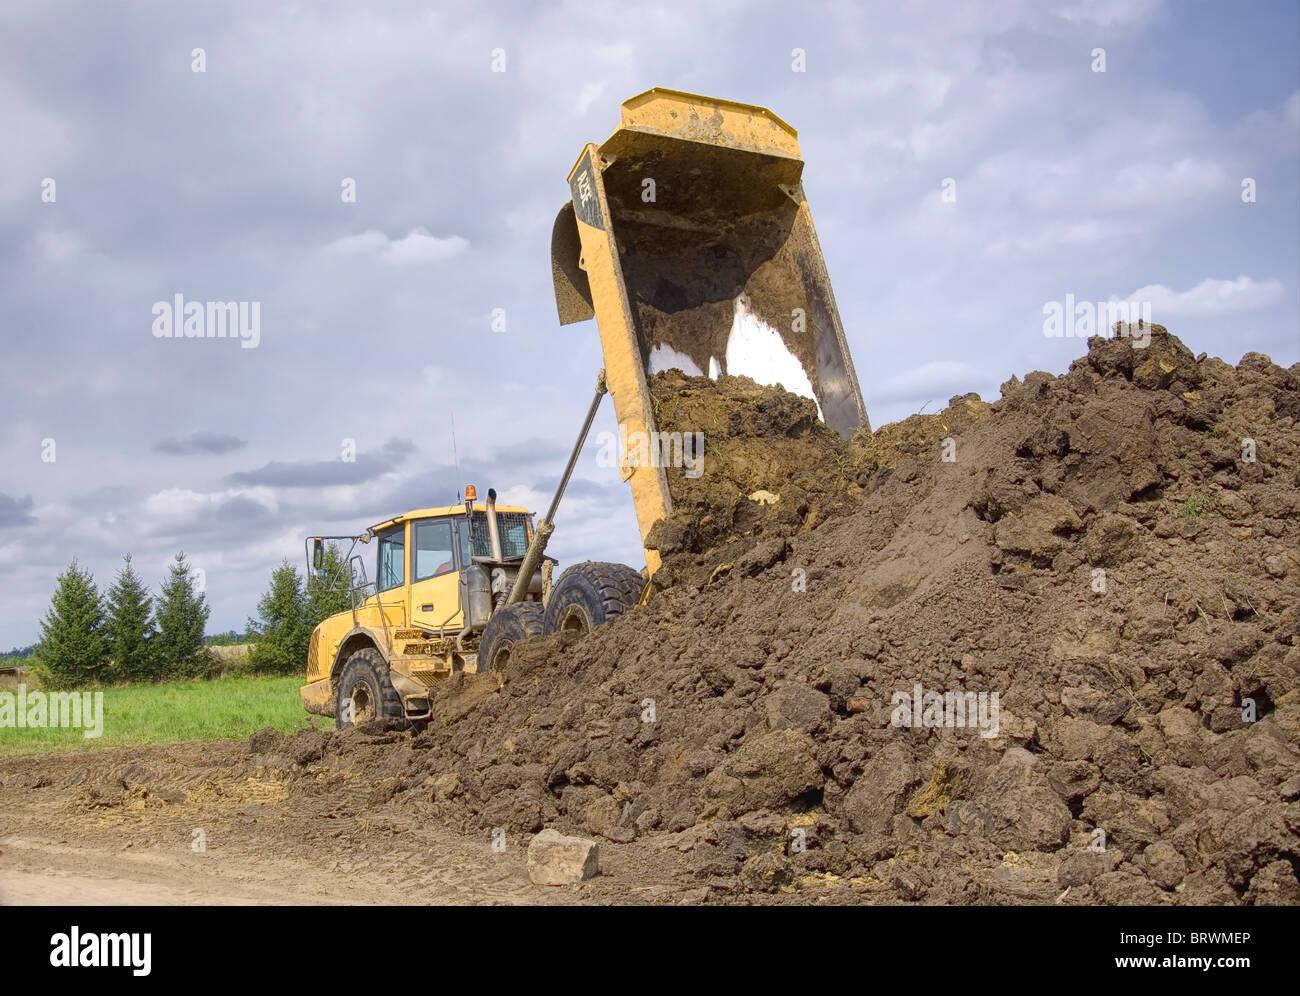 Heavy duty dump truck dumping soil - Stock Image